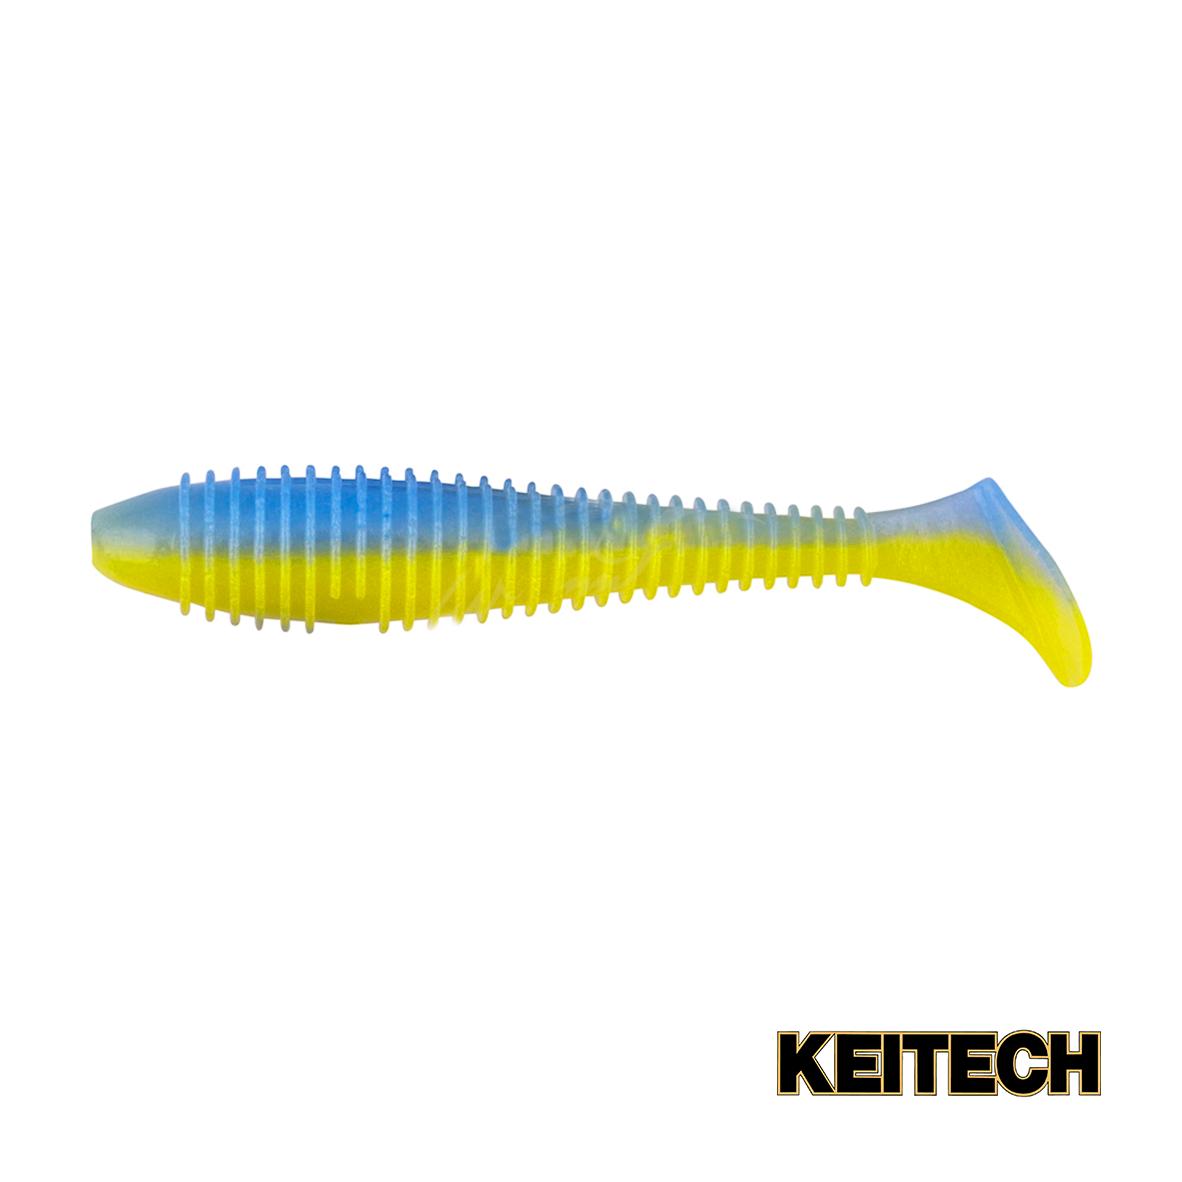 "Силикон Keitech Swing Impact FAT 3.8"" (6 шт/упак) ц:ea#12 ua limi"